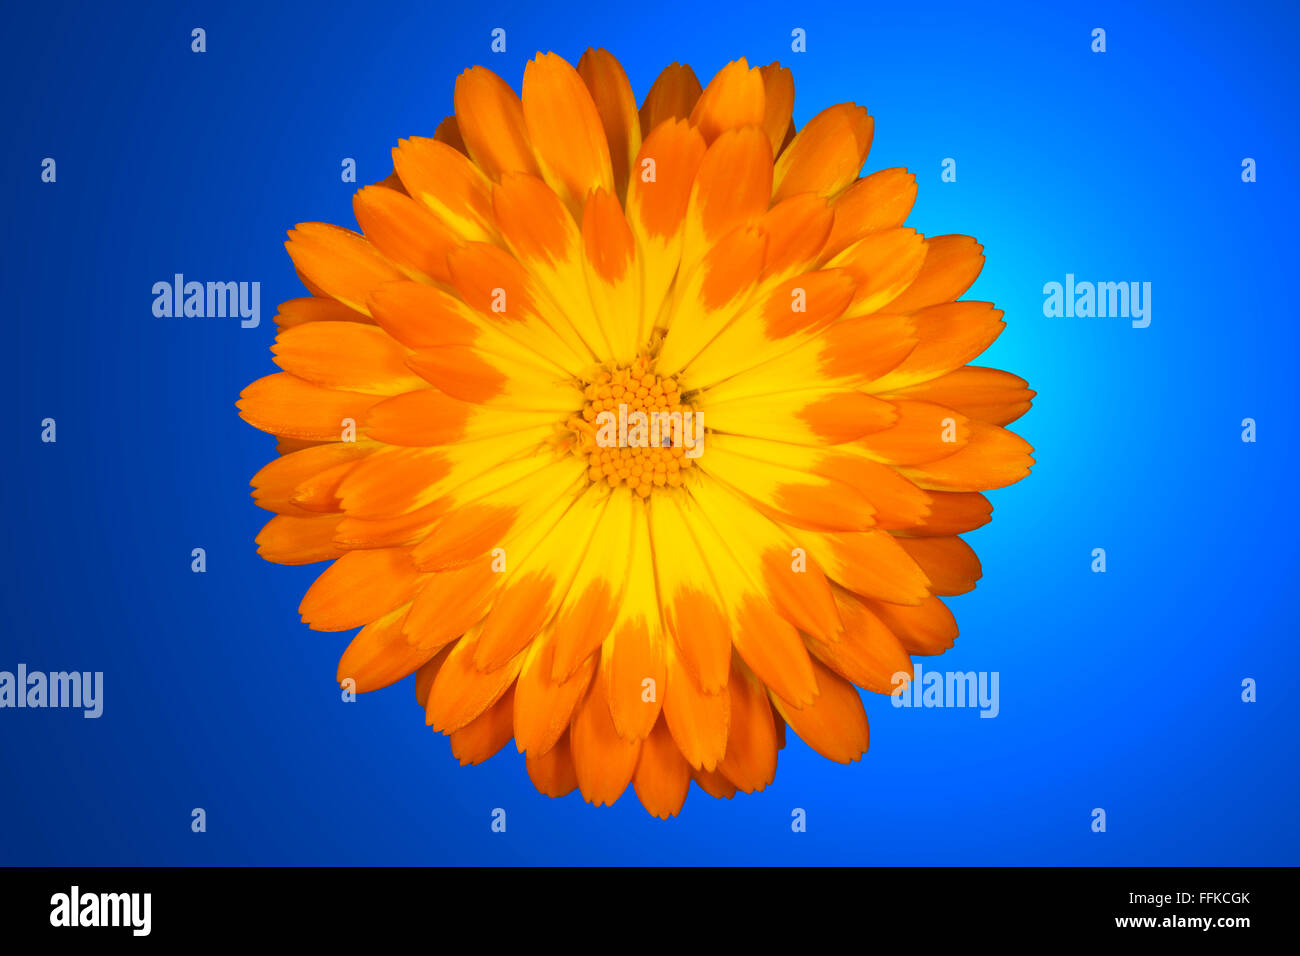 Orange Marigold Flower Against A Blue Background Stock Photo